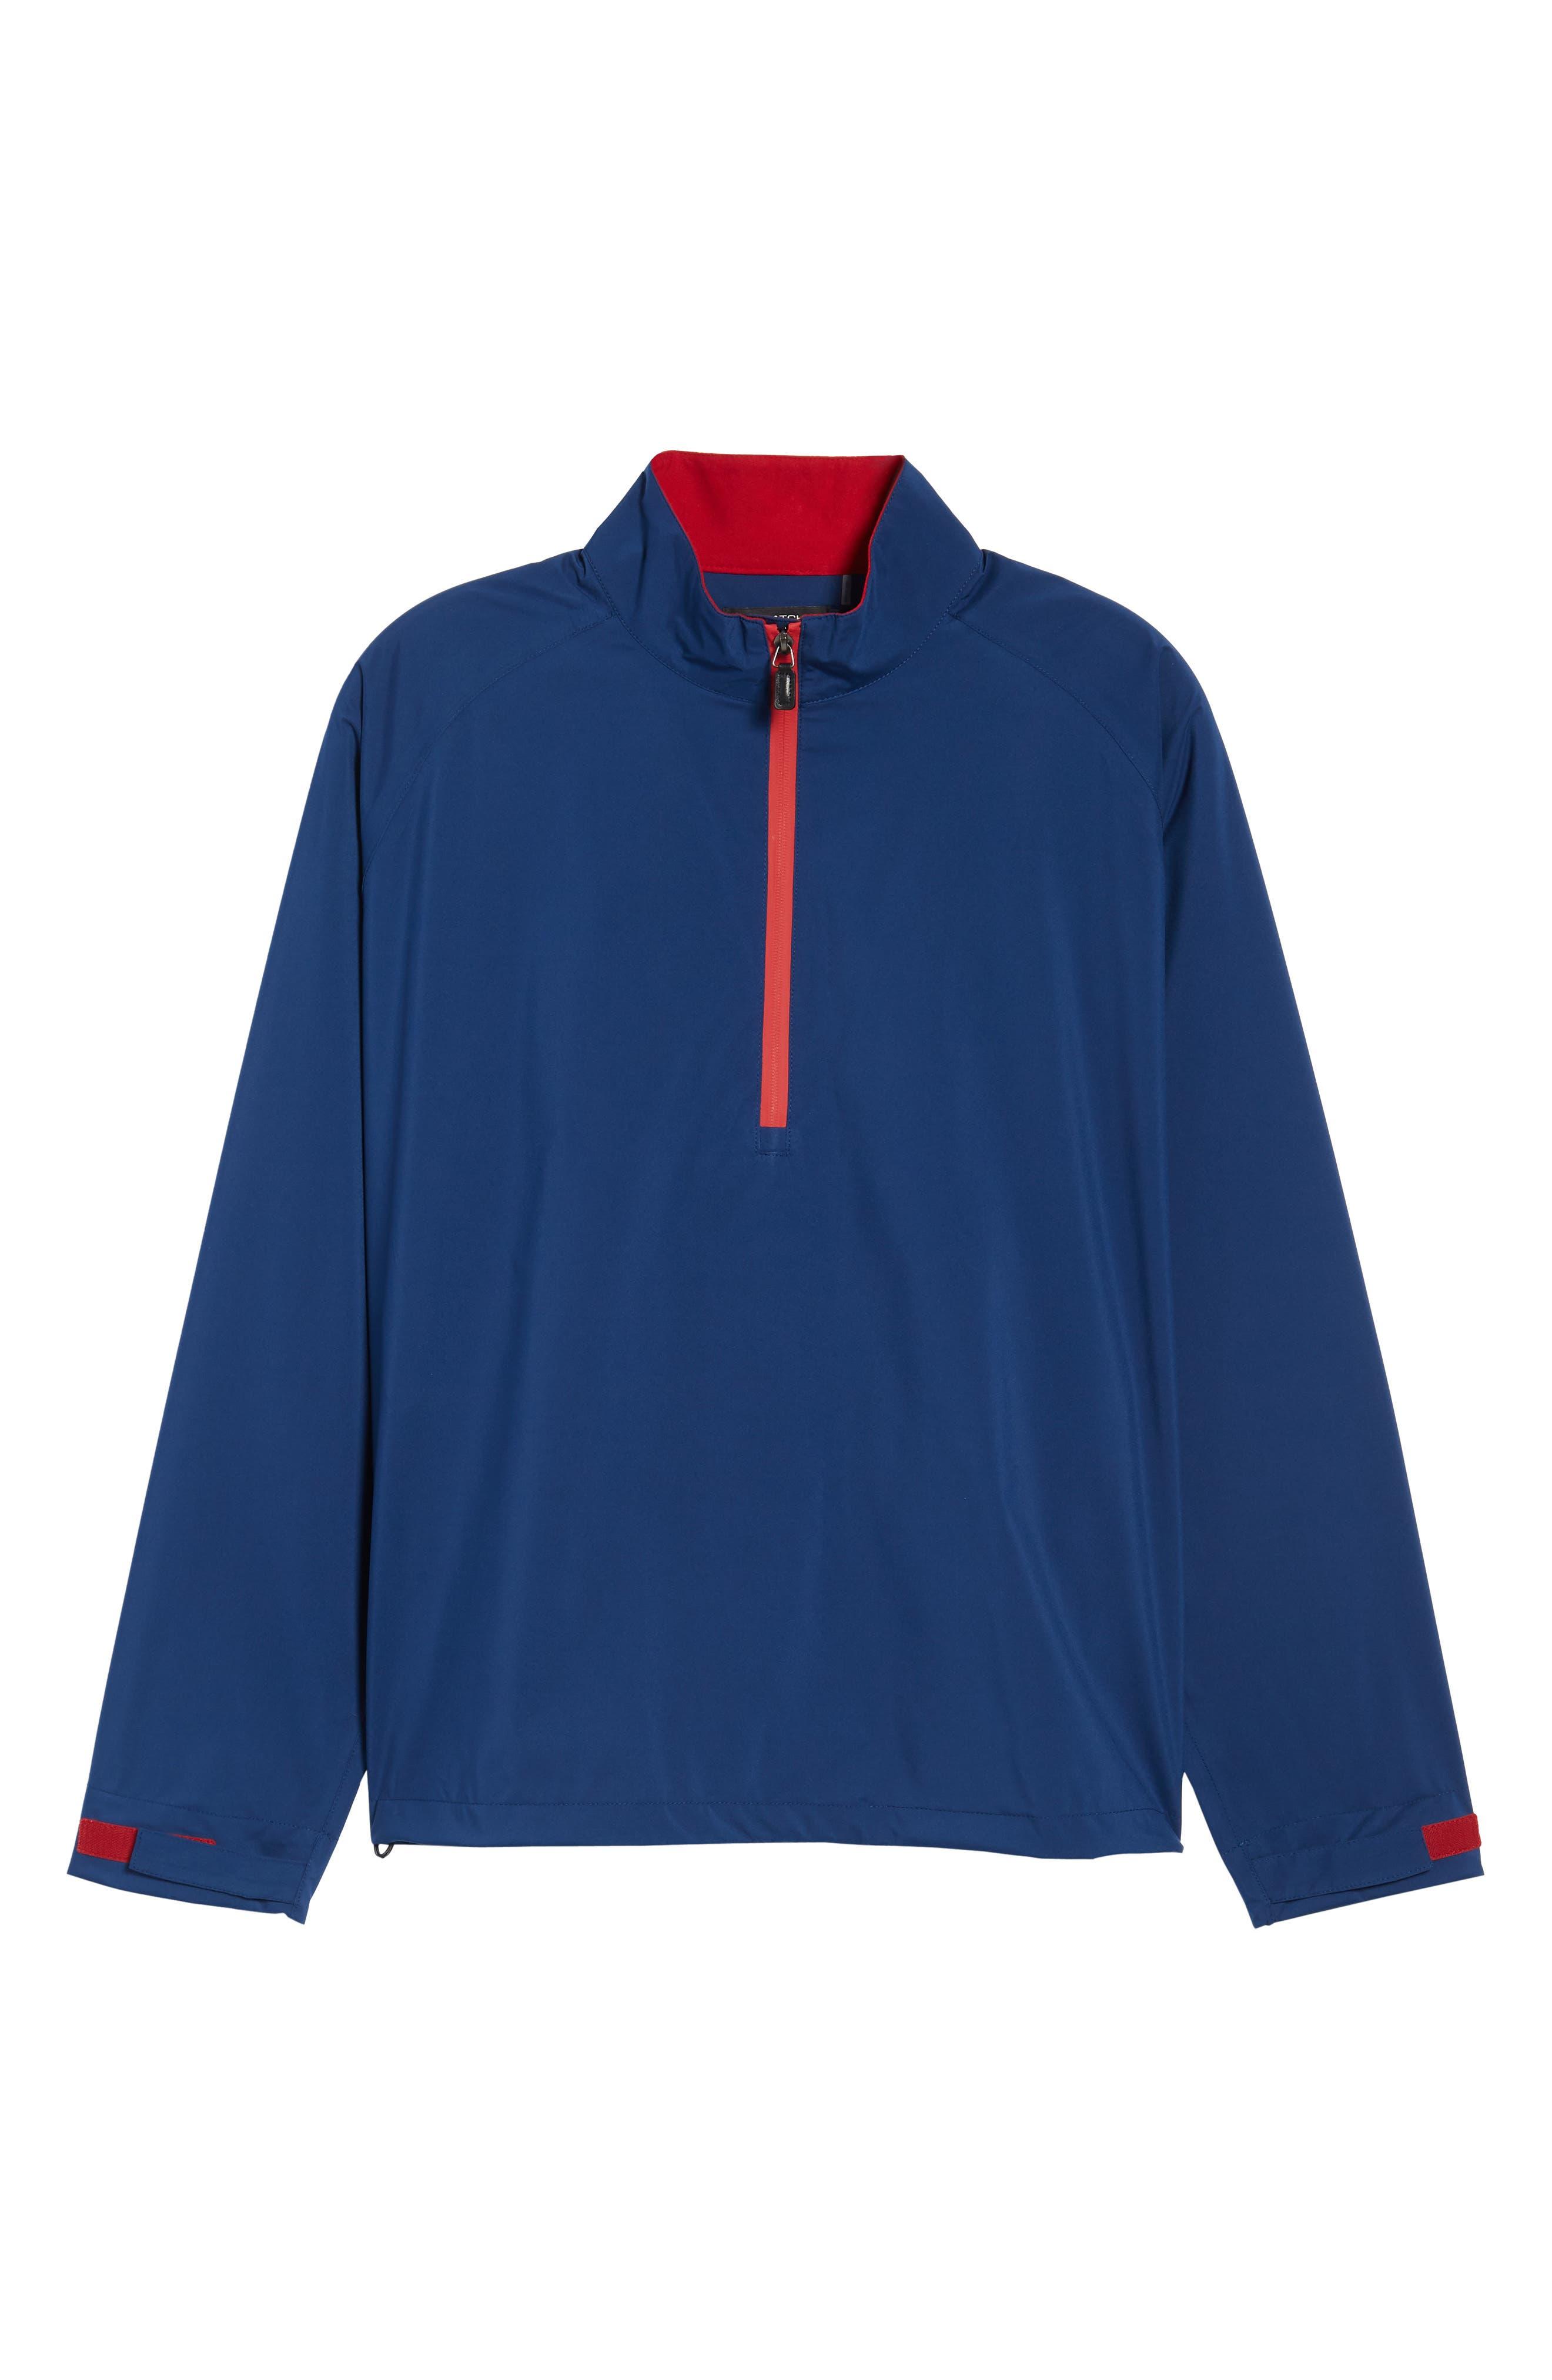 Regular Fit Half Zip Performance Pullover,                             Alternate thumbnail 6, color,                             Navy